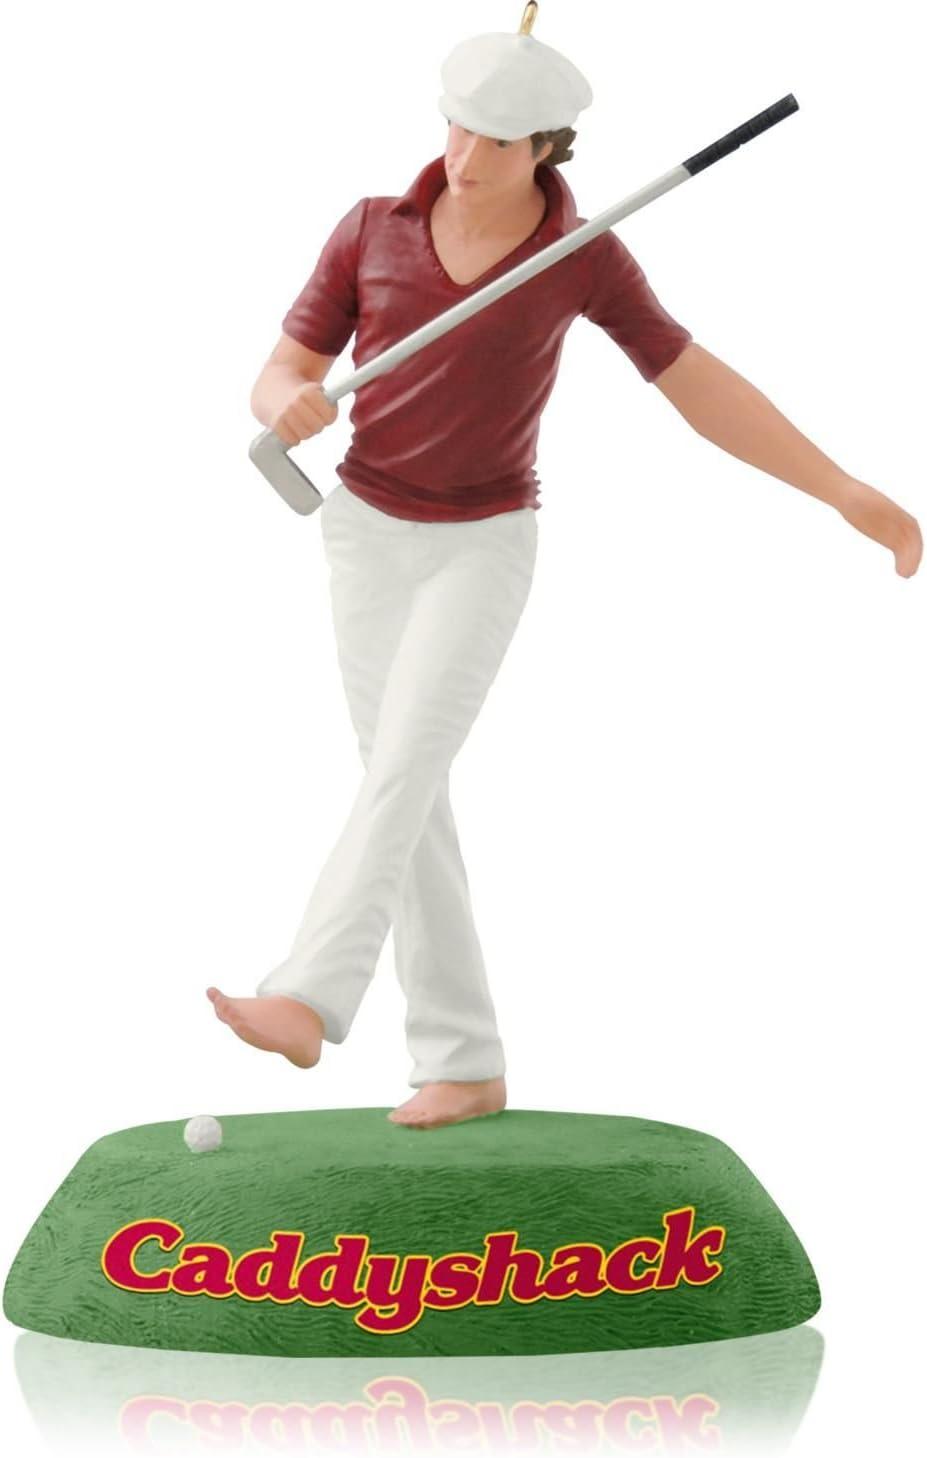 Hallmark The Zen of Golf - Caddyshack - 2014 Keepsake Ornament